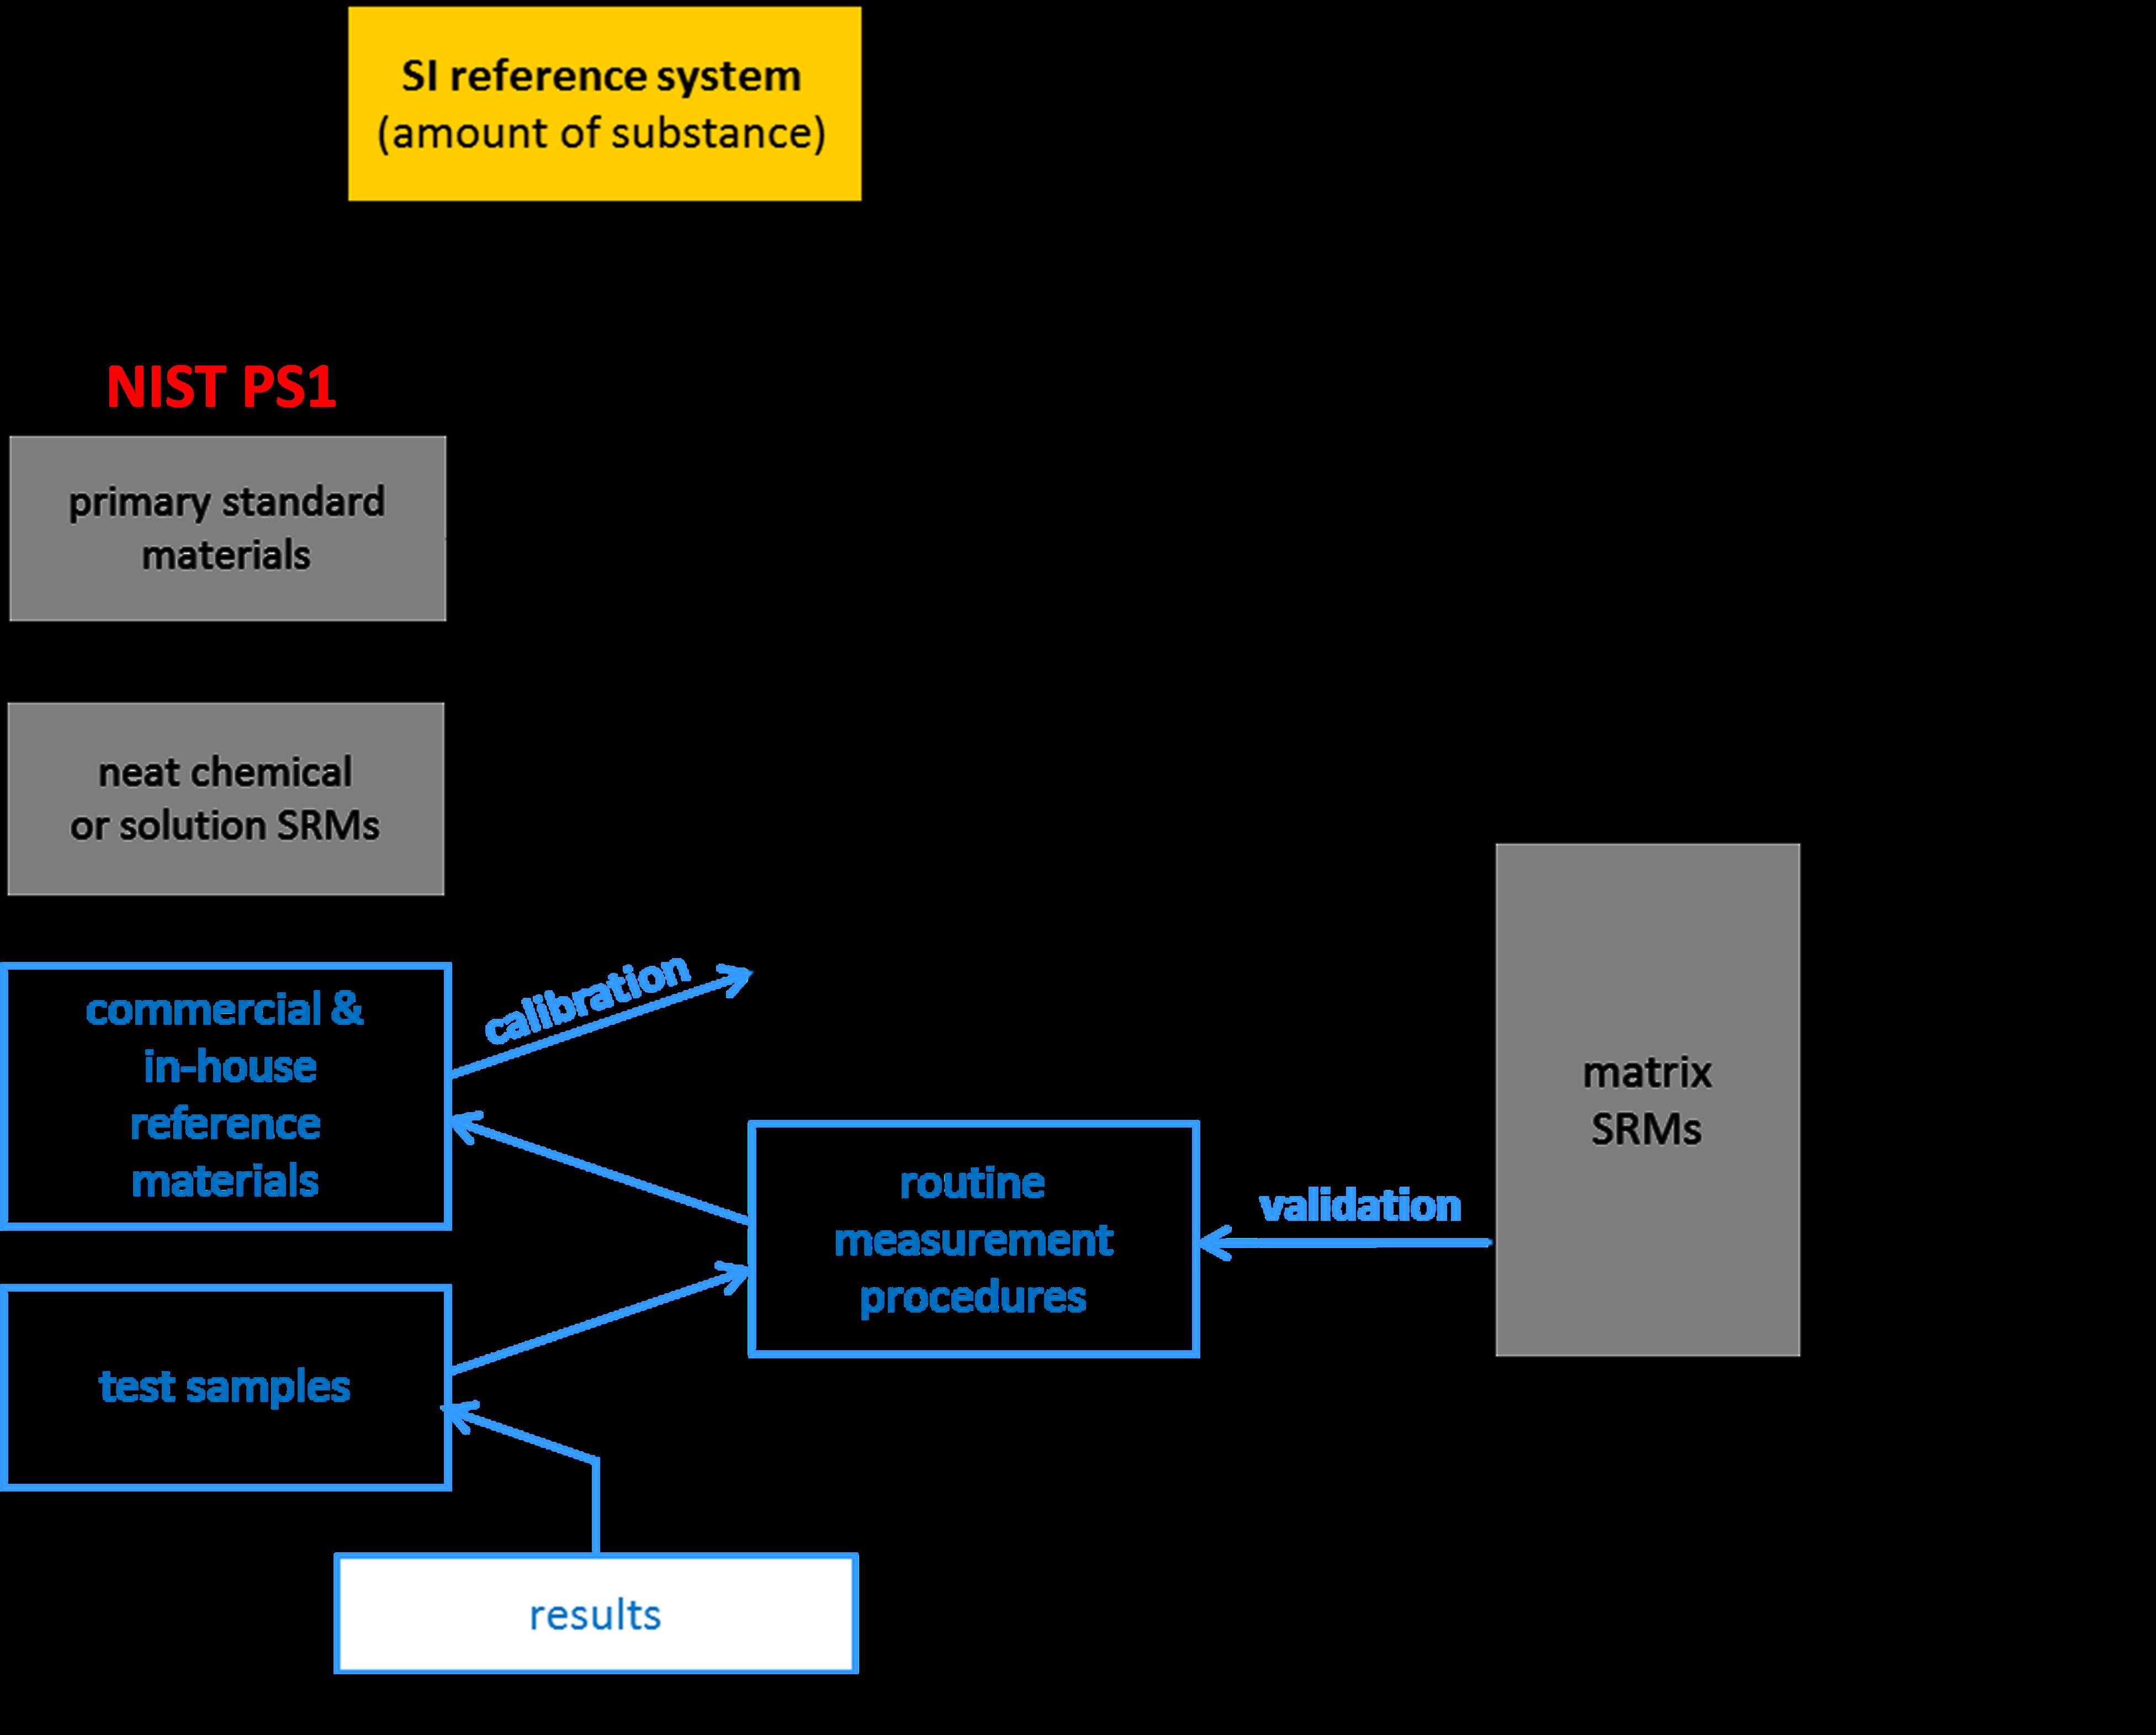 Nist Ps1 Primary Standard For Quantitative Nmr Benzoic Acid Nist